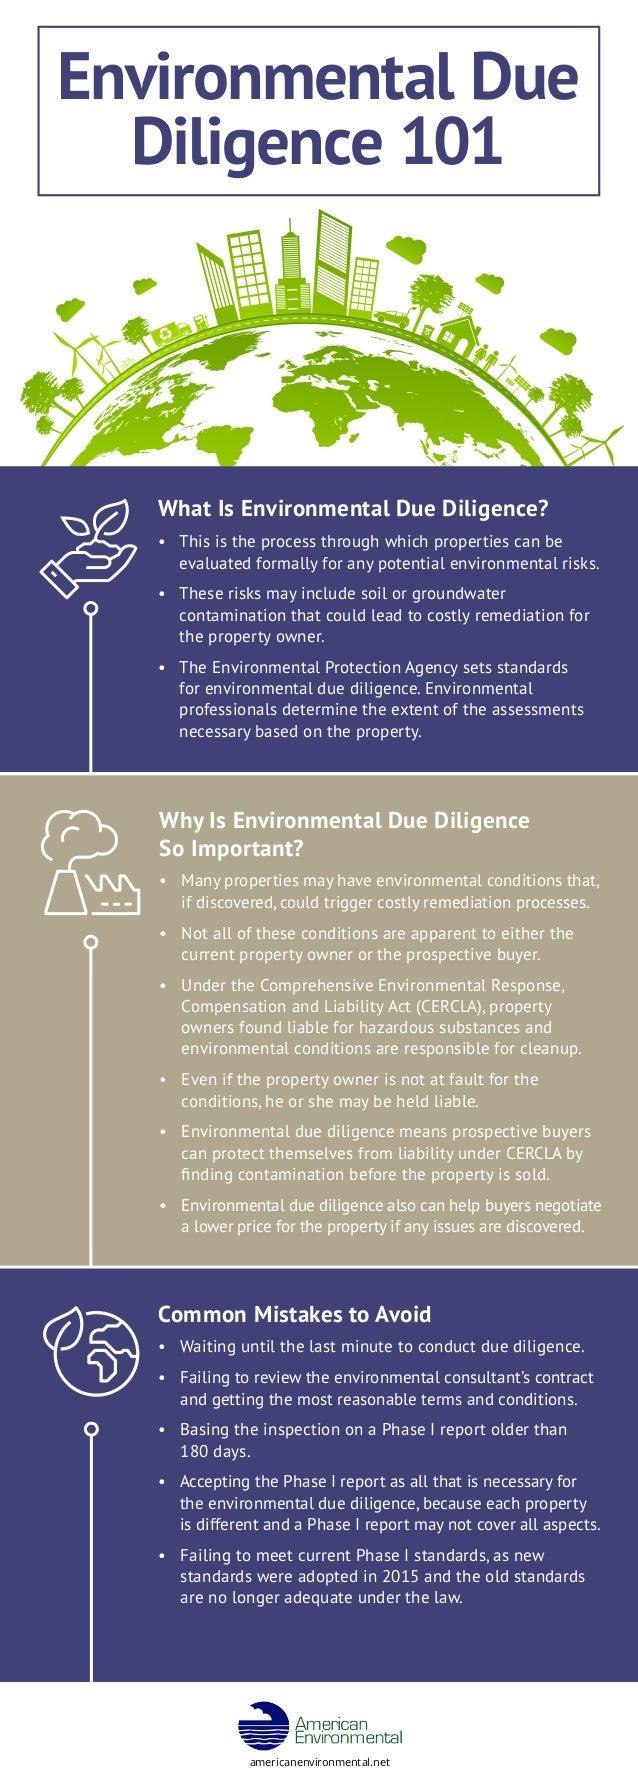 Environmental Due Dilligence